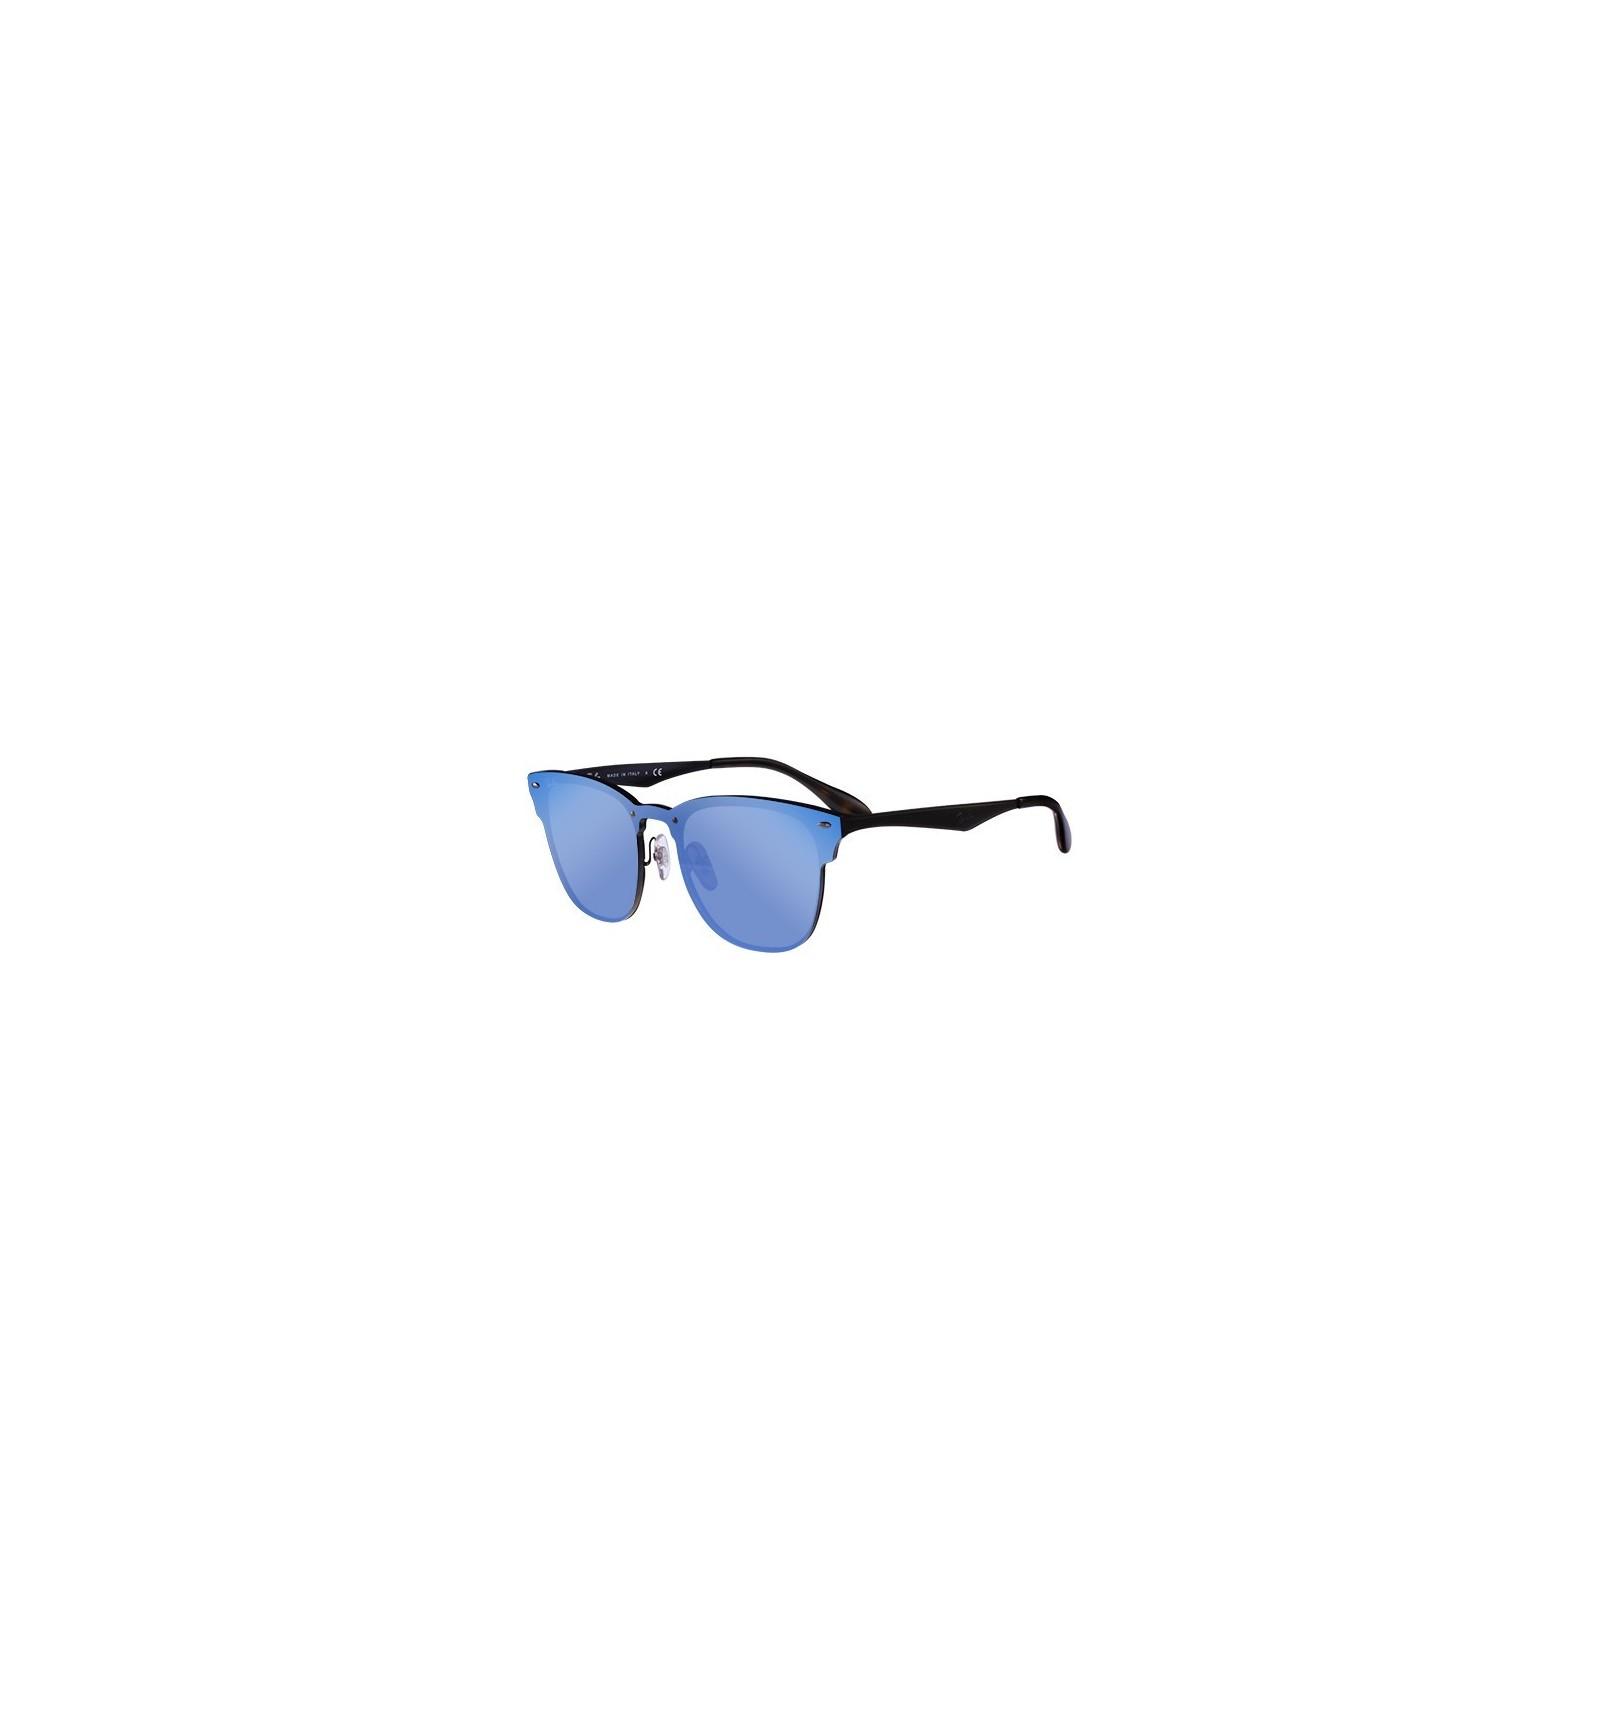 c895287e9f Gafas de sol RAY BAN RB3576 Blaze Clubmaster Black - Blue Mirror